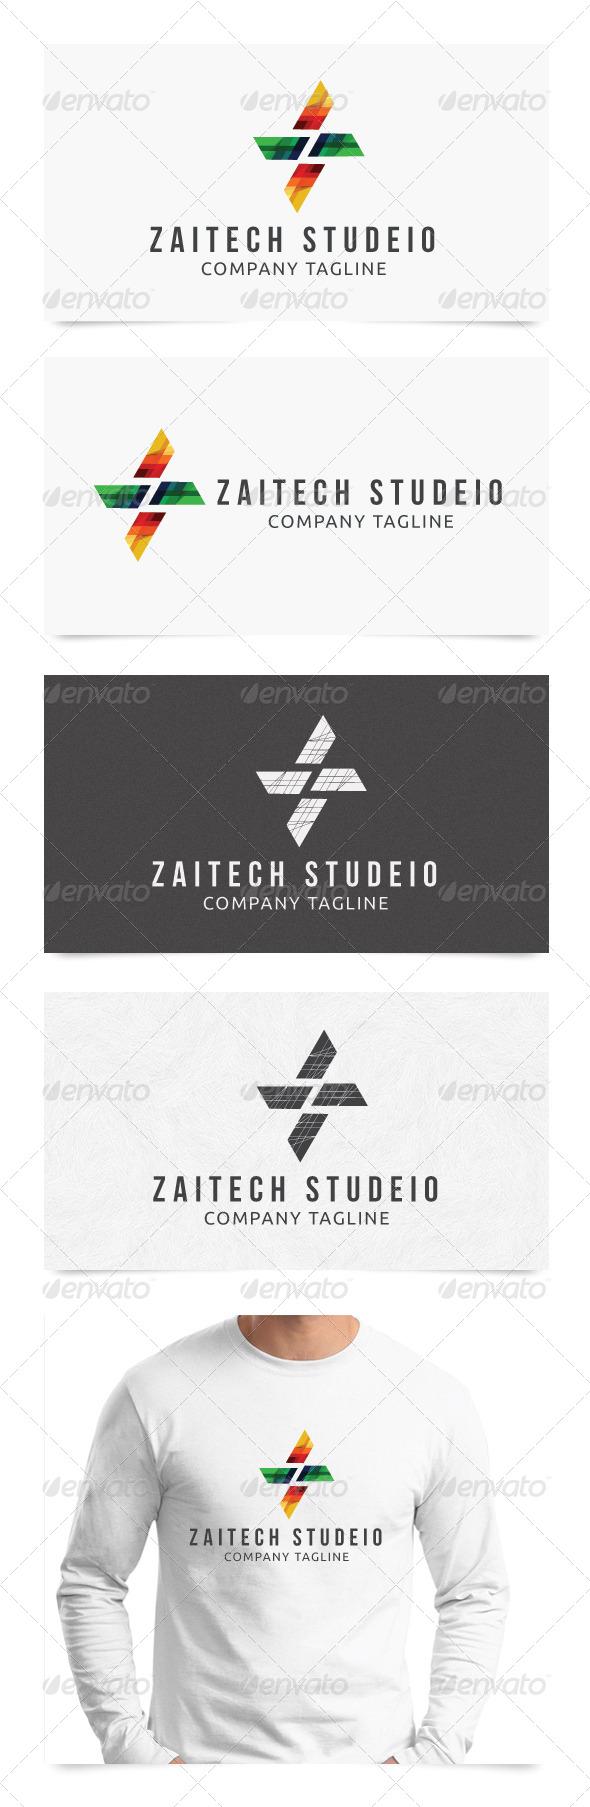 GraphicRiver Zaitech Studeio 5057156